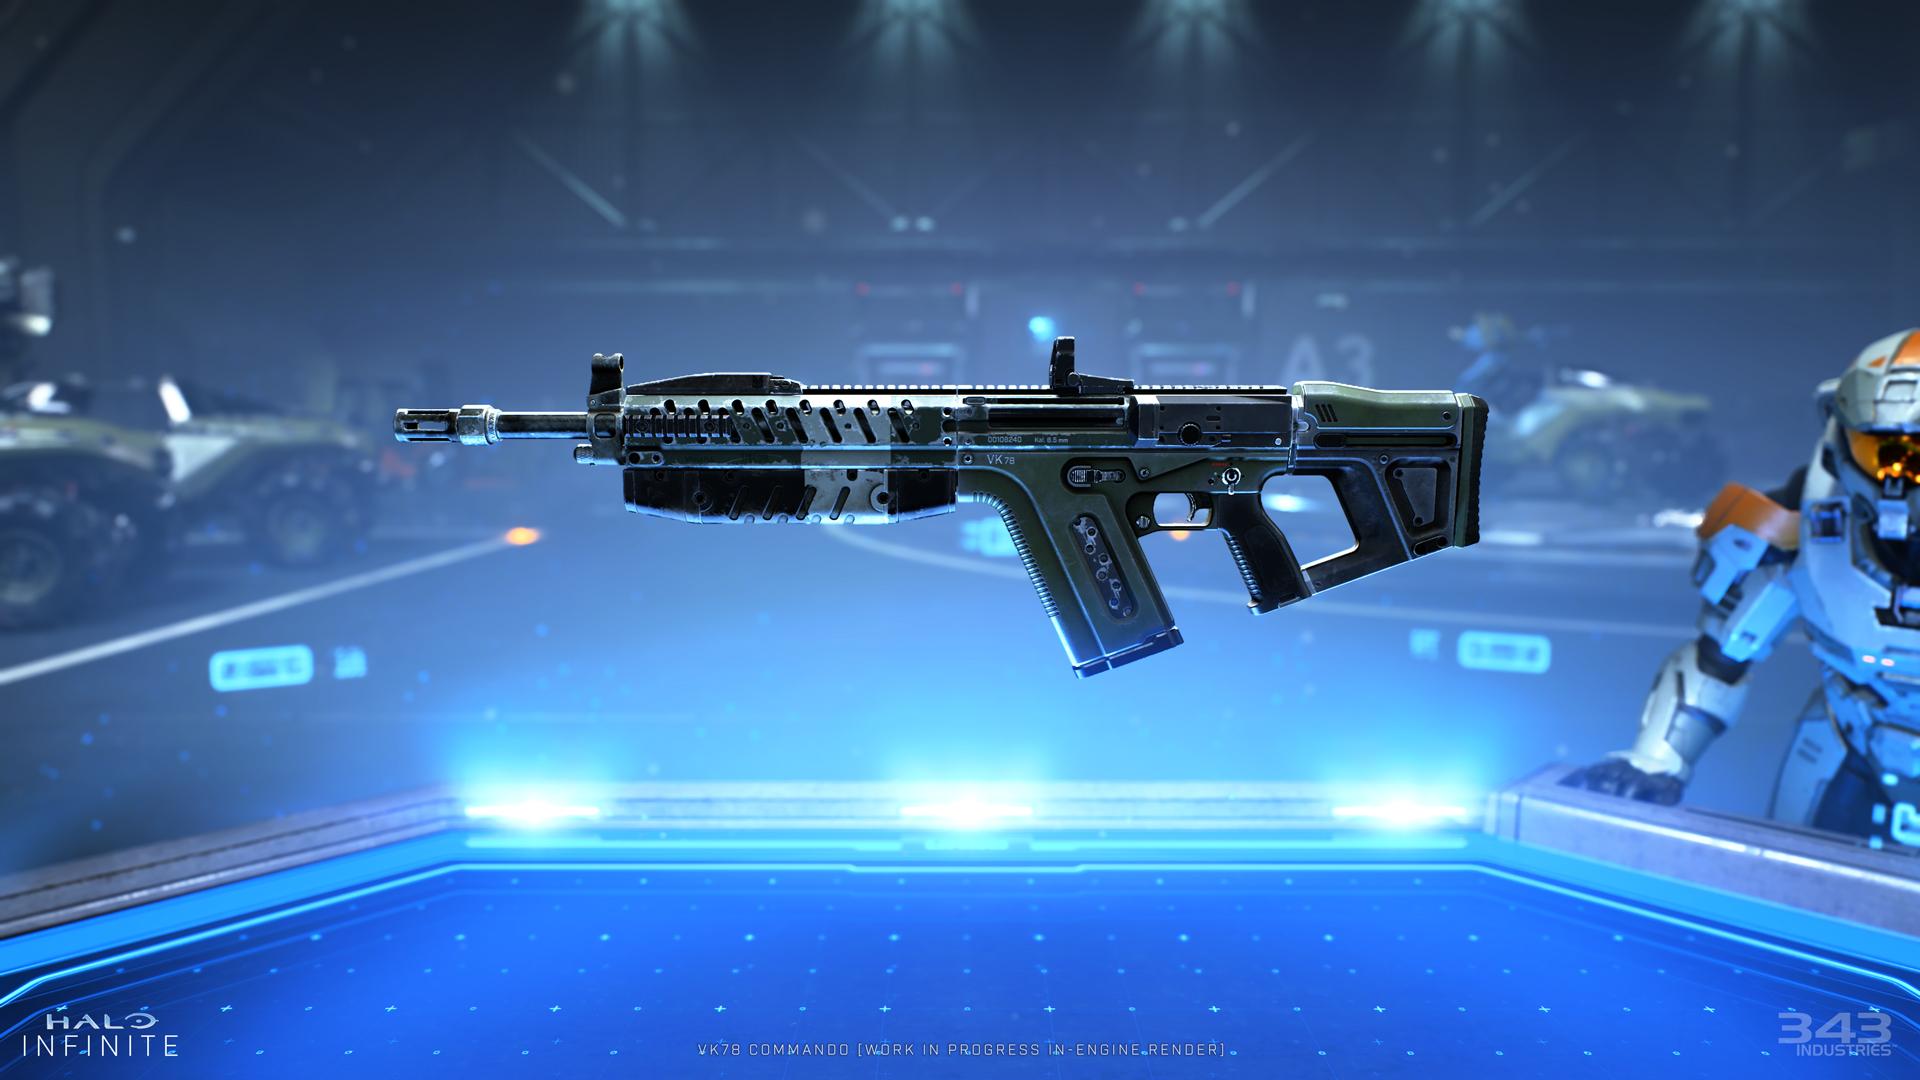 Halo Infinite gun